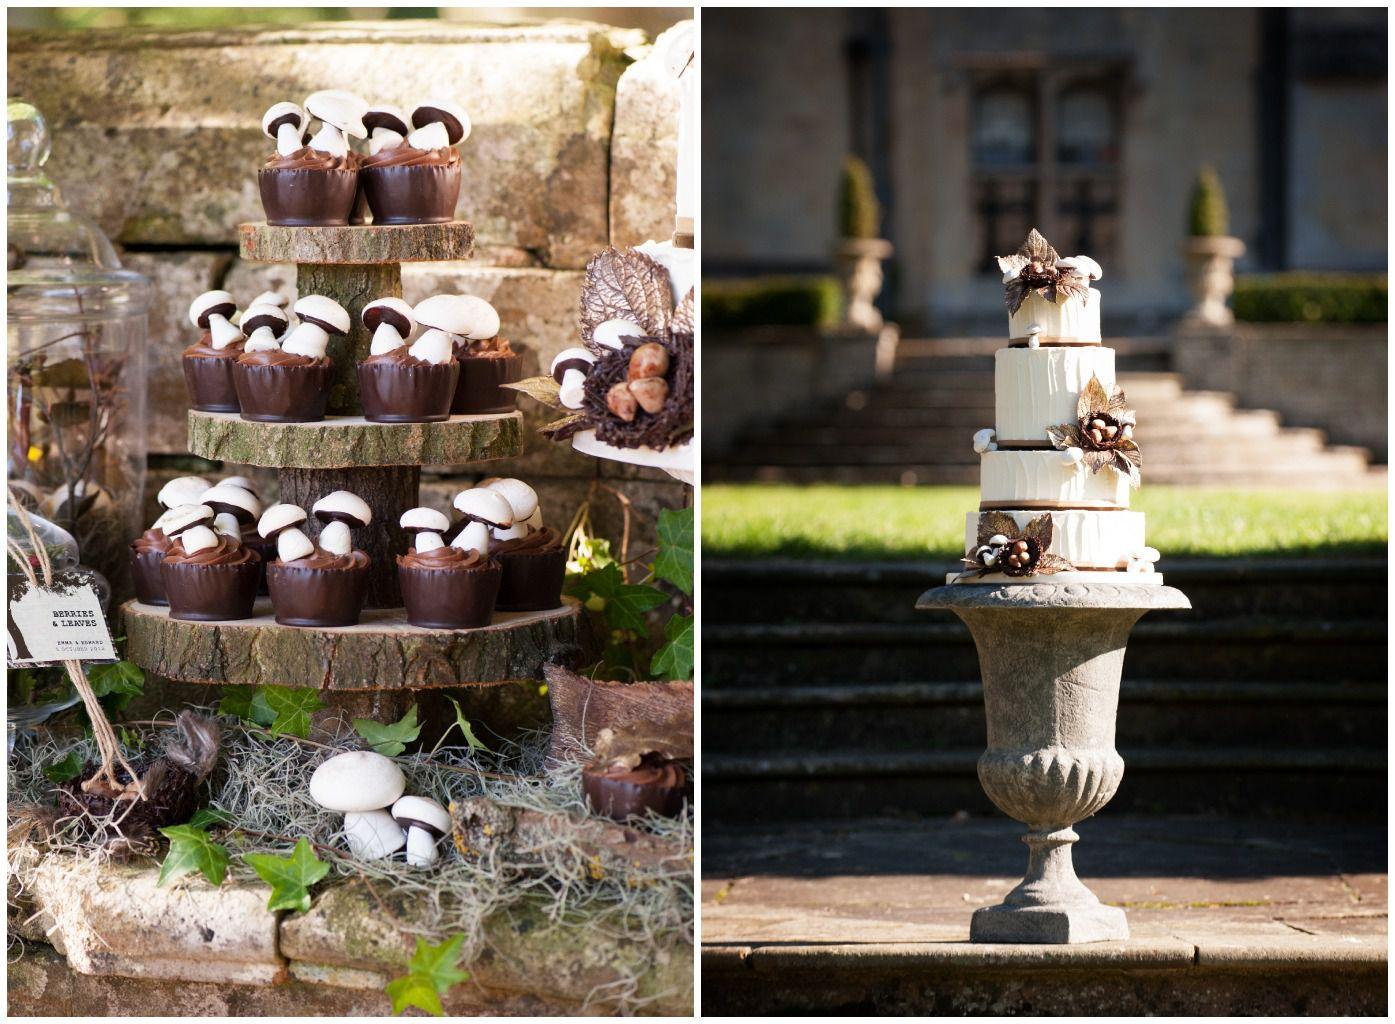 Chic Rustic Country Wedding: Woodland Themed Wedding Cake